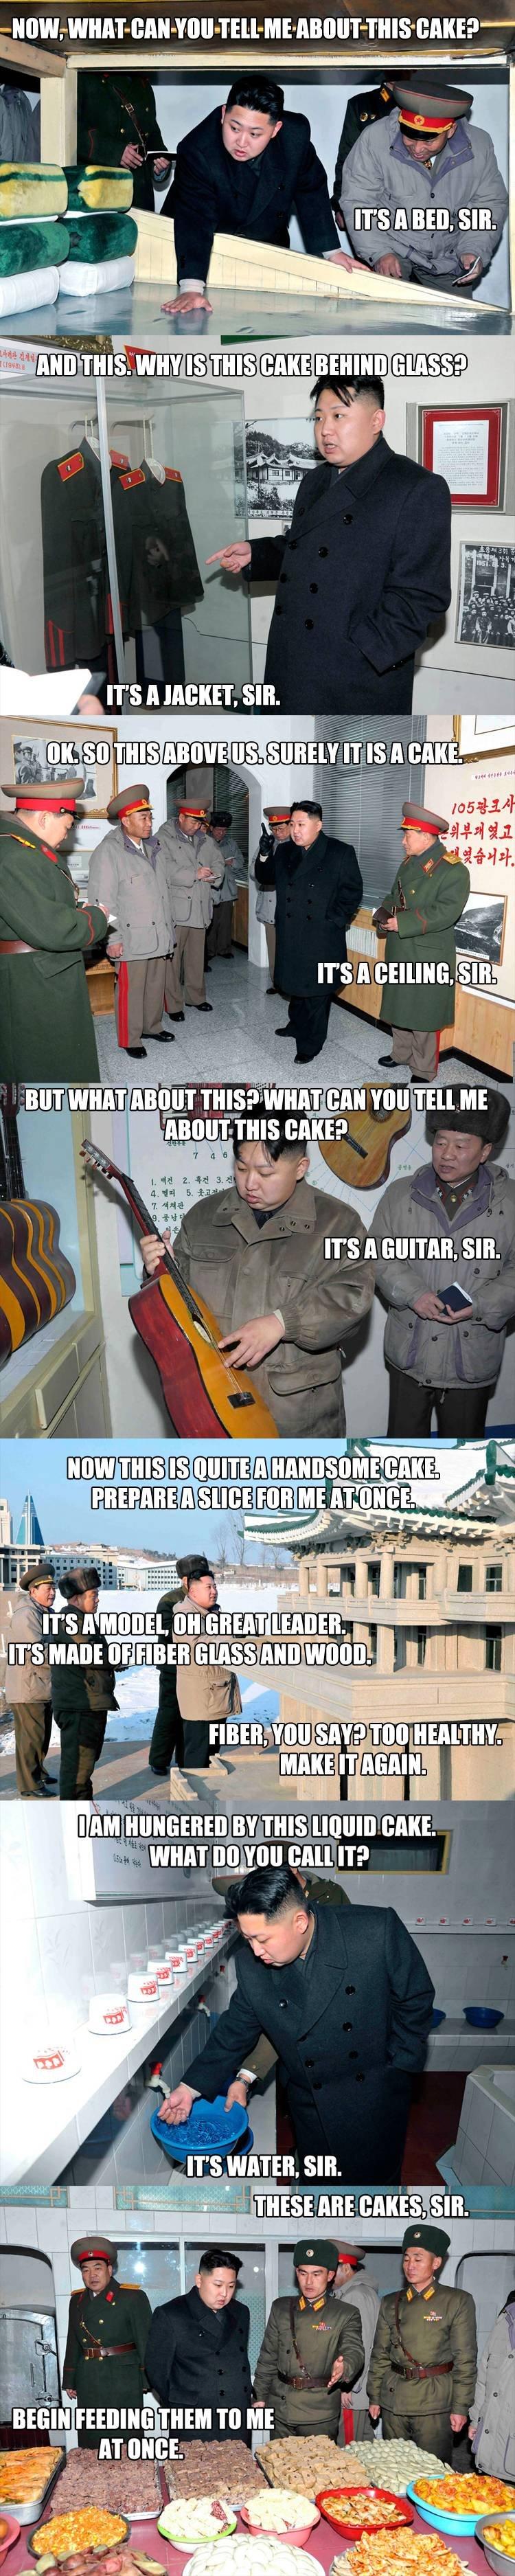 North korea. admin. t teii' ima/ Iii, 5/ main can